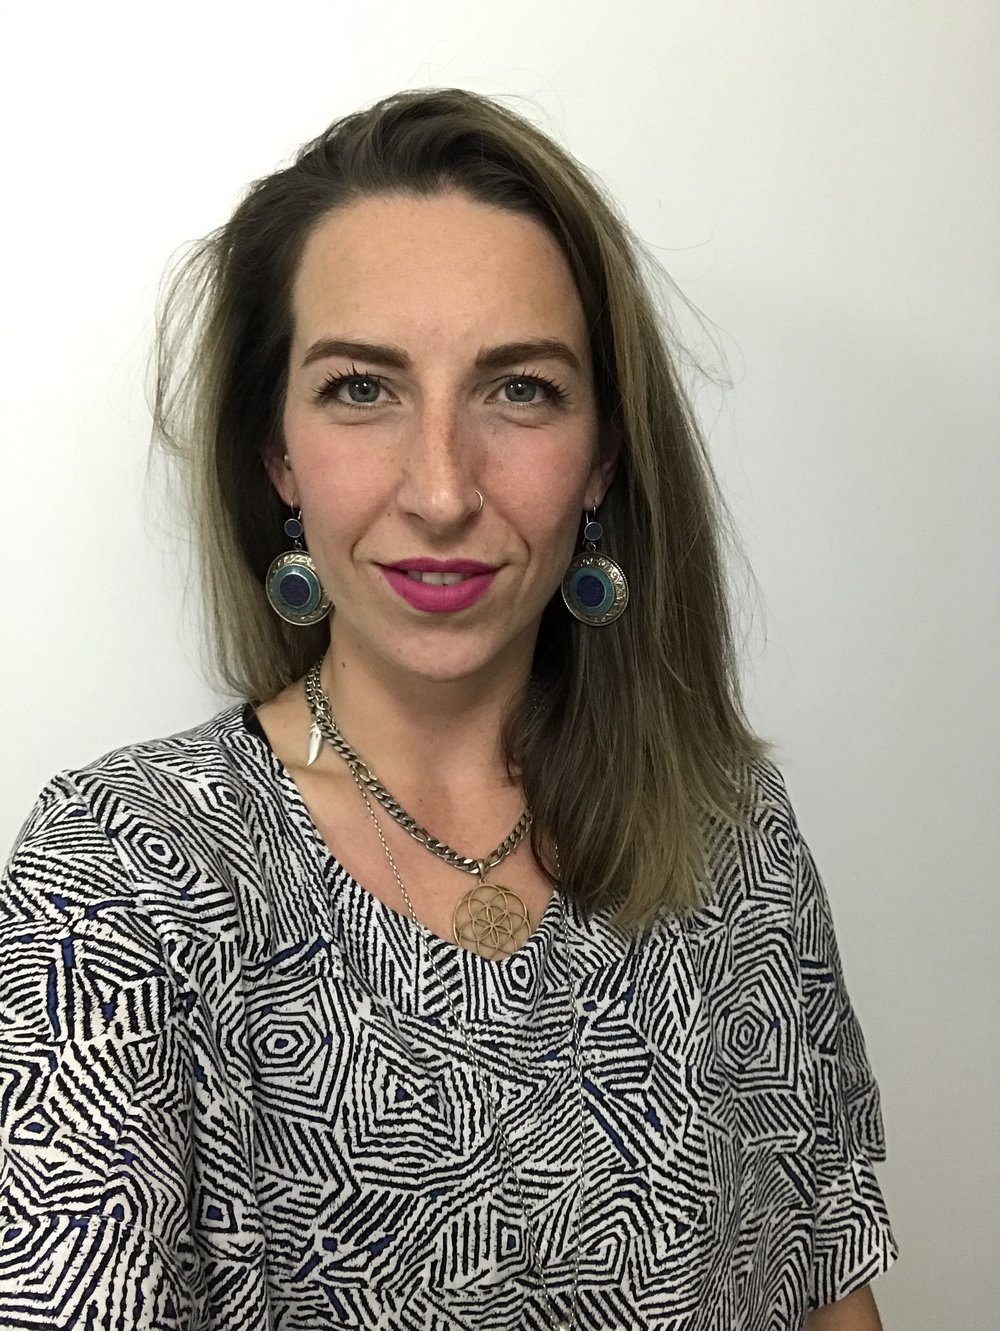 Emily Campbell-Burdett, Expressive Arts Therapist